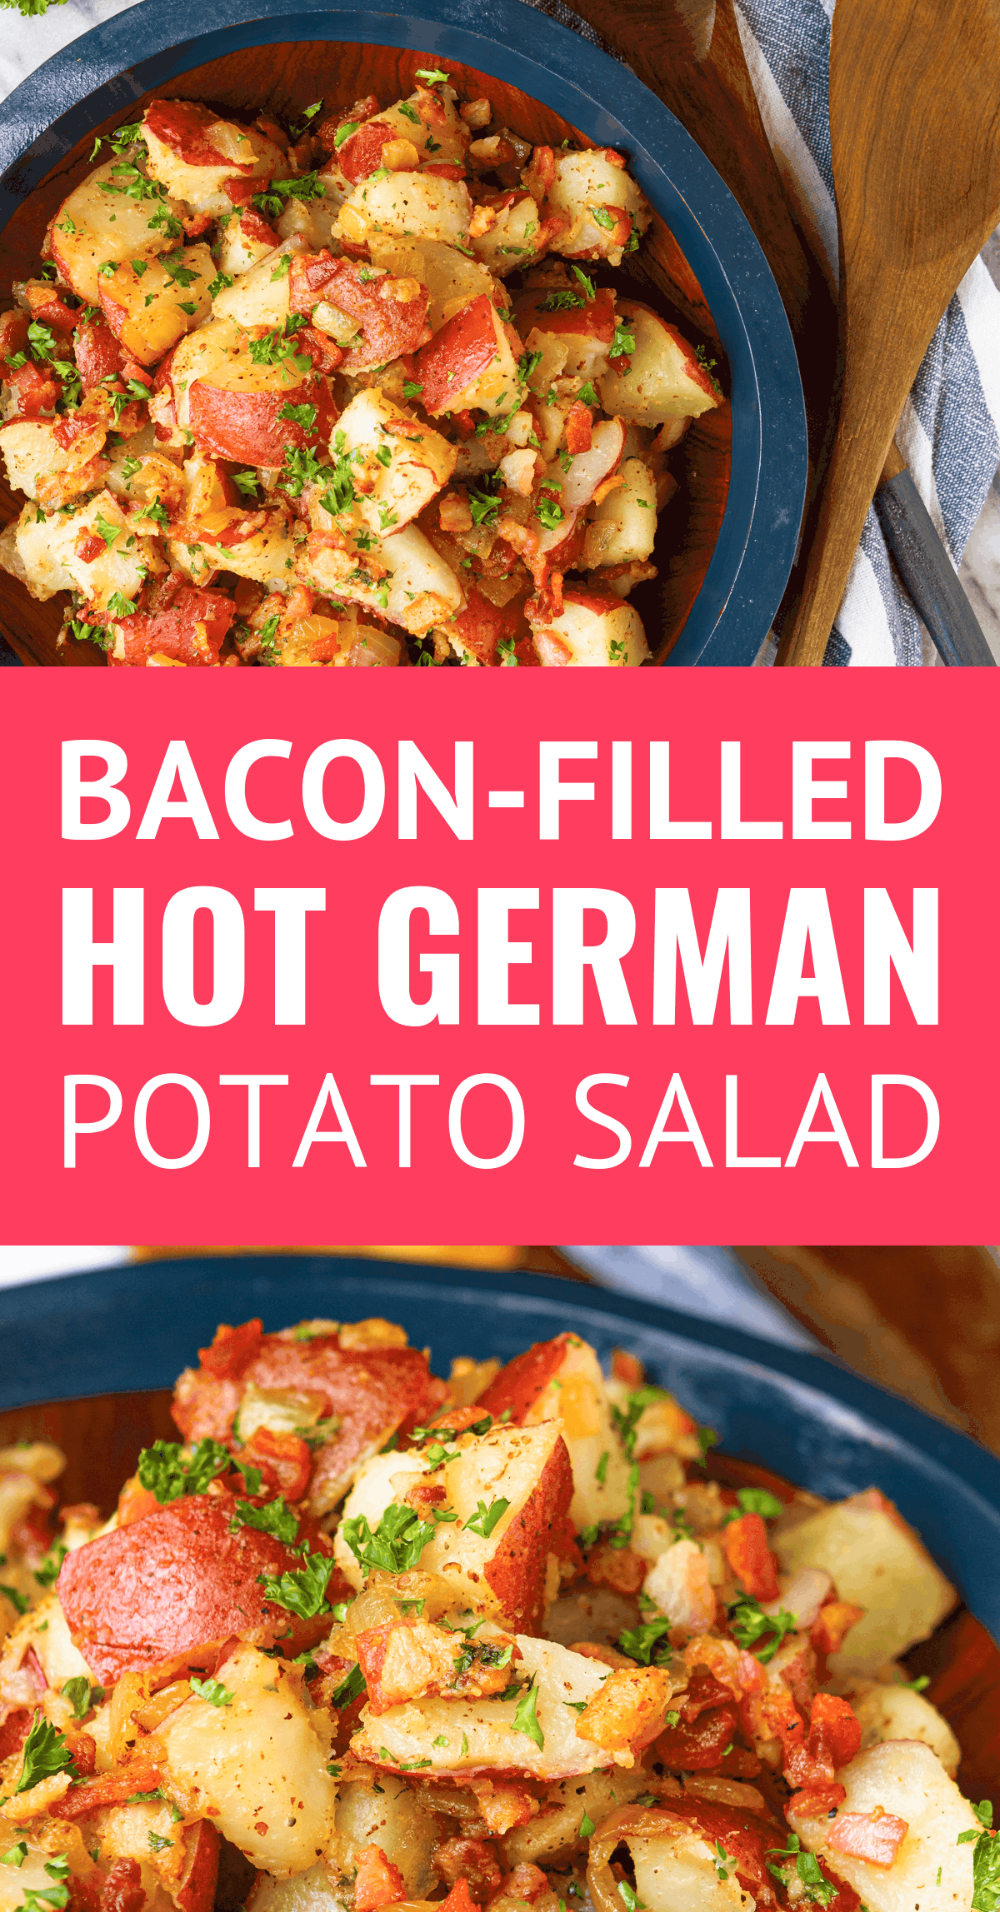 Oktoberfest Pork Shank Recipe - Food Republic  German Hot Dish